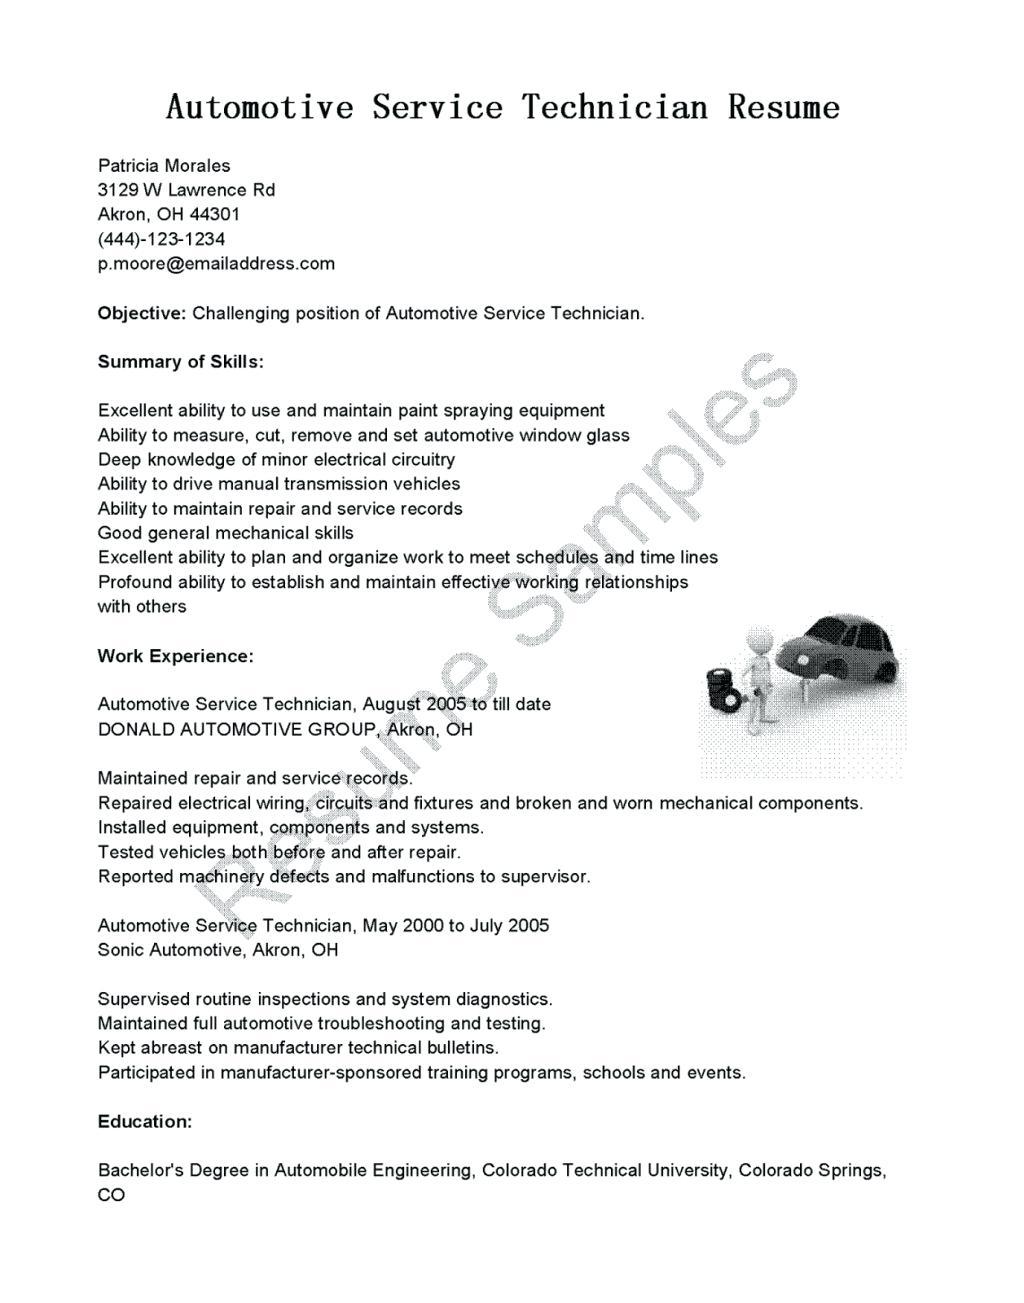 Auto Mechanic Resume Sample 2019 Auto Mechanic CV 2020 automotive mechanic resume sample automobile mechanic resume sample auto mechanic cv sample auto technician resume sample vehicle mechanic resume sample automotive mechanic cv sample